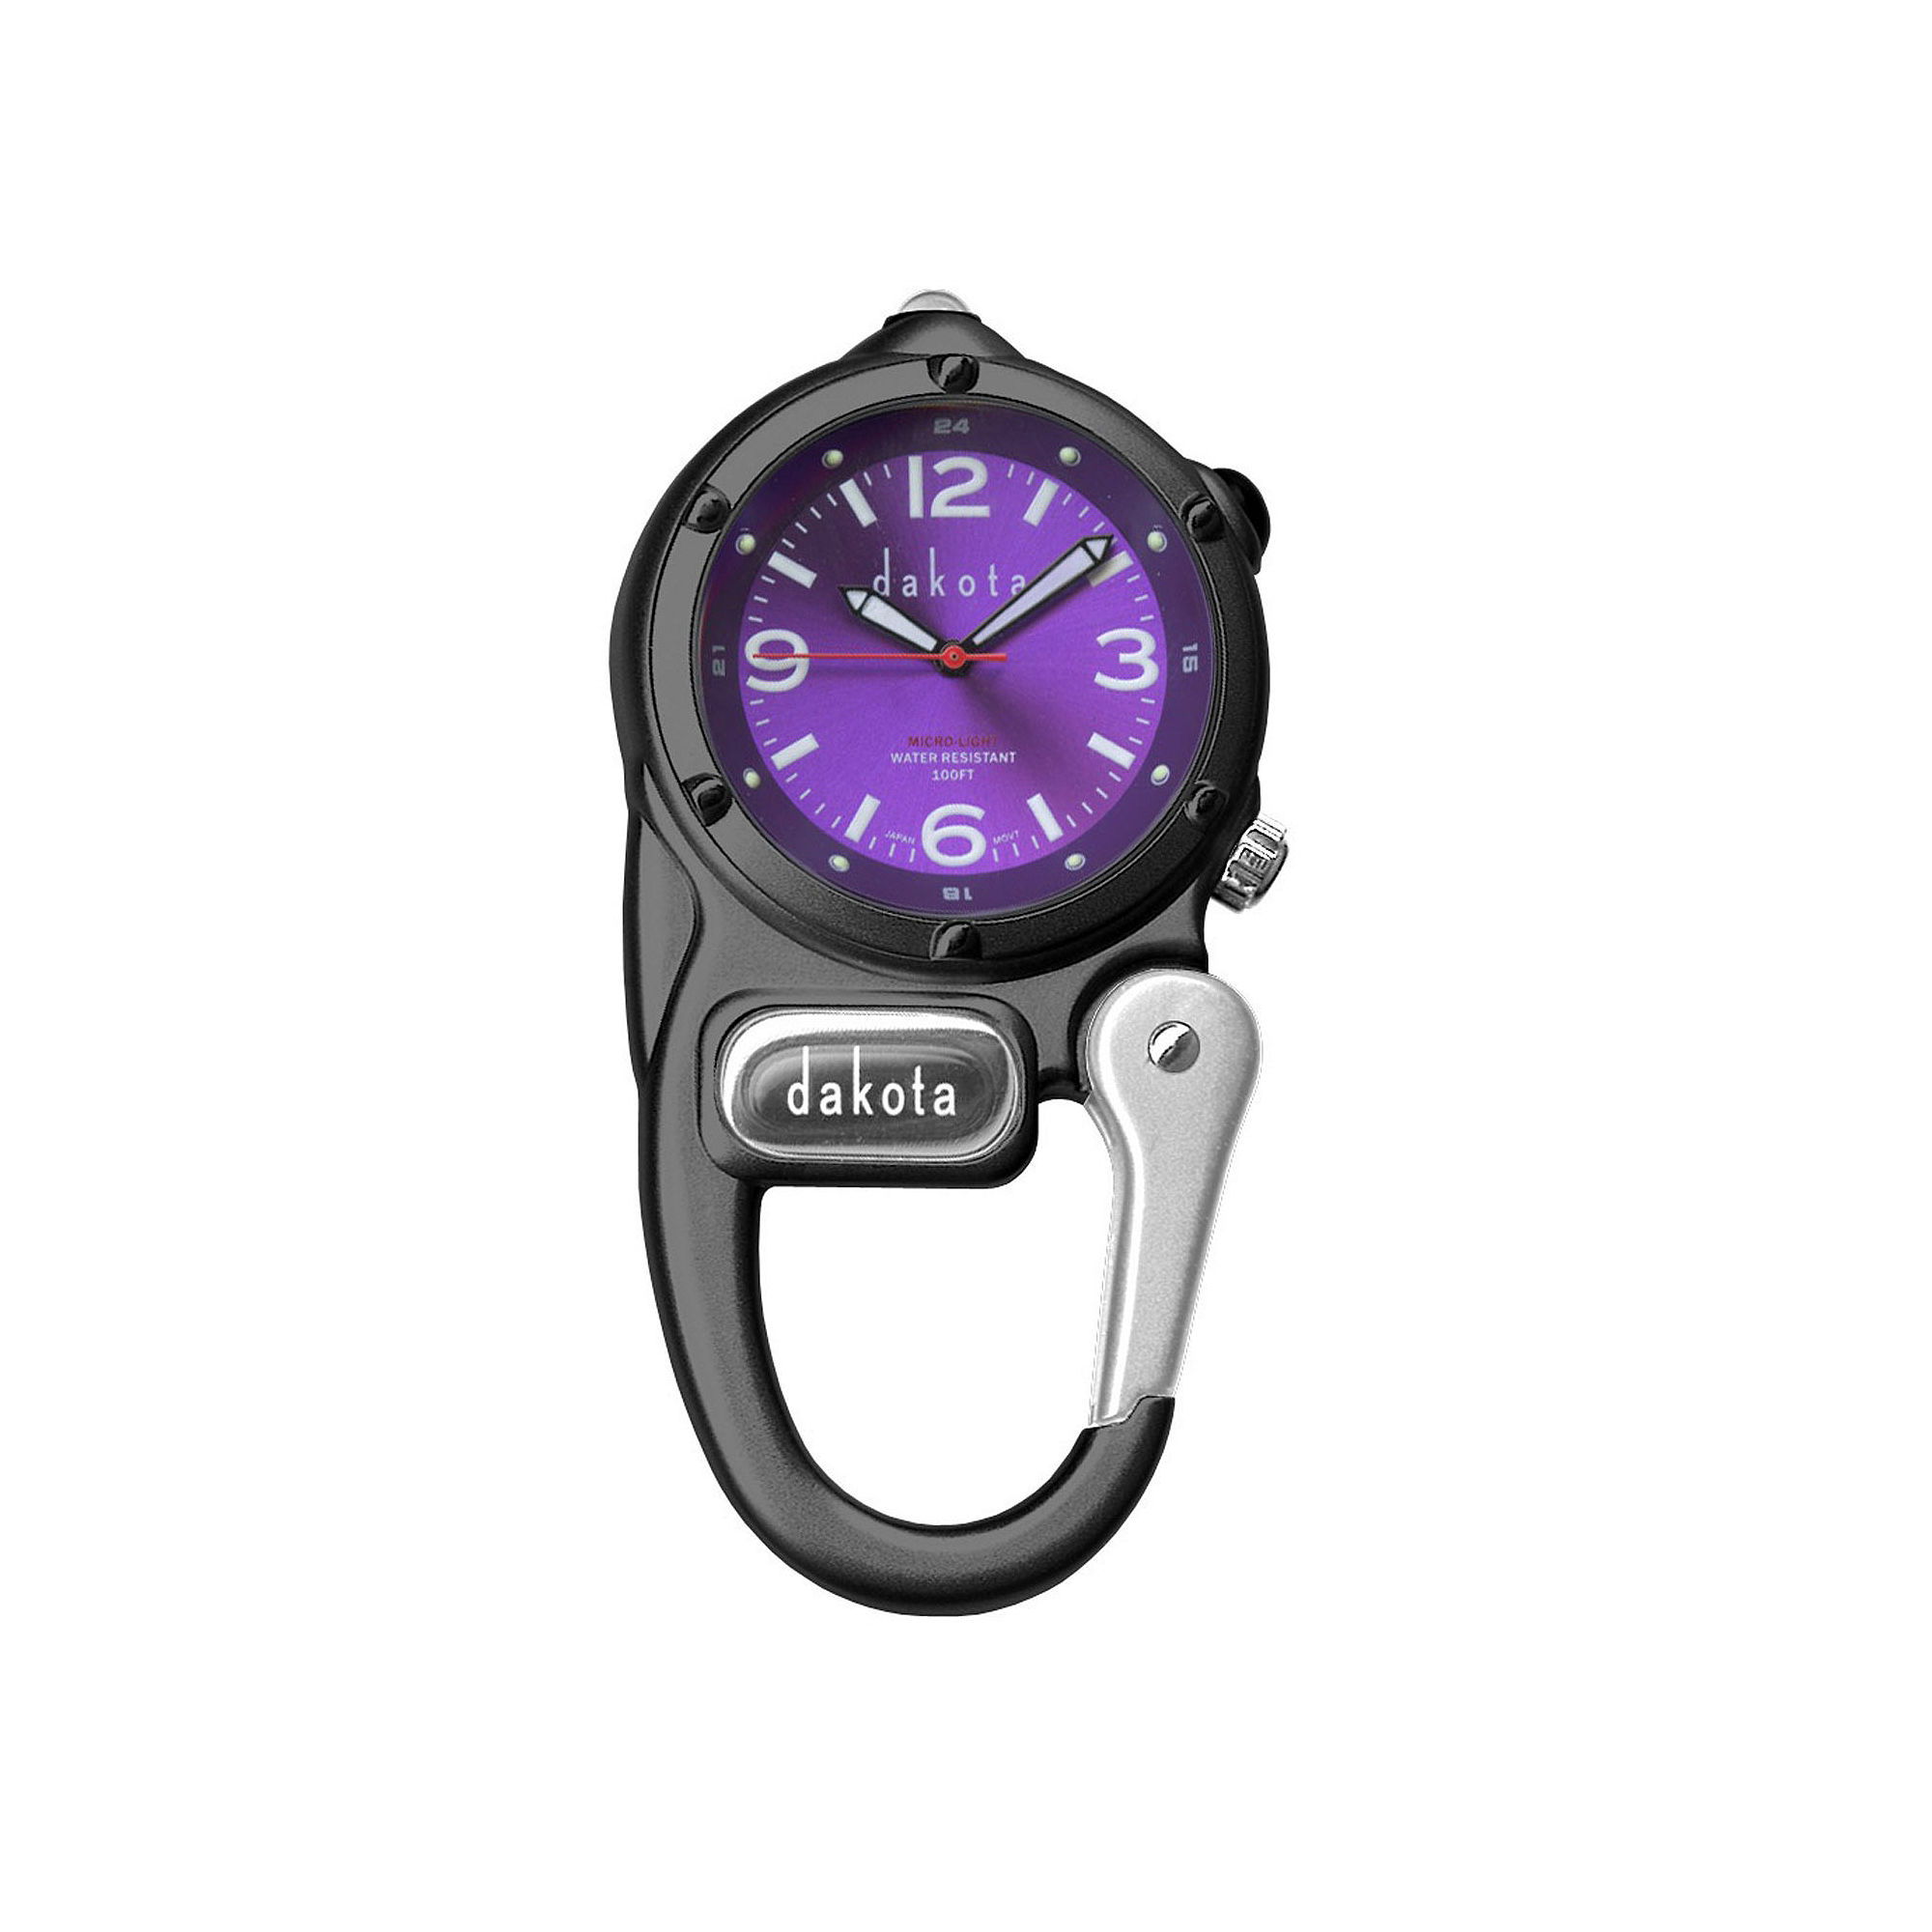 Dakota Mini Clip Microlight Carabiner, Black and Purple Pocket Watch 38589